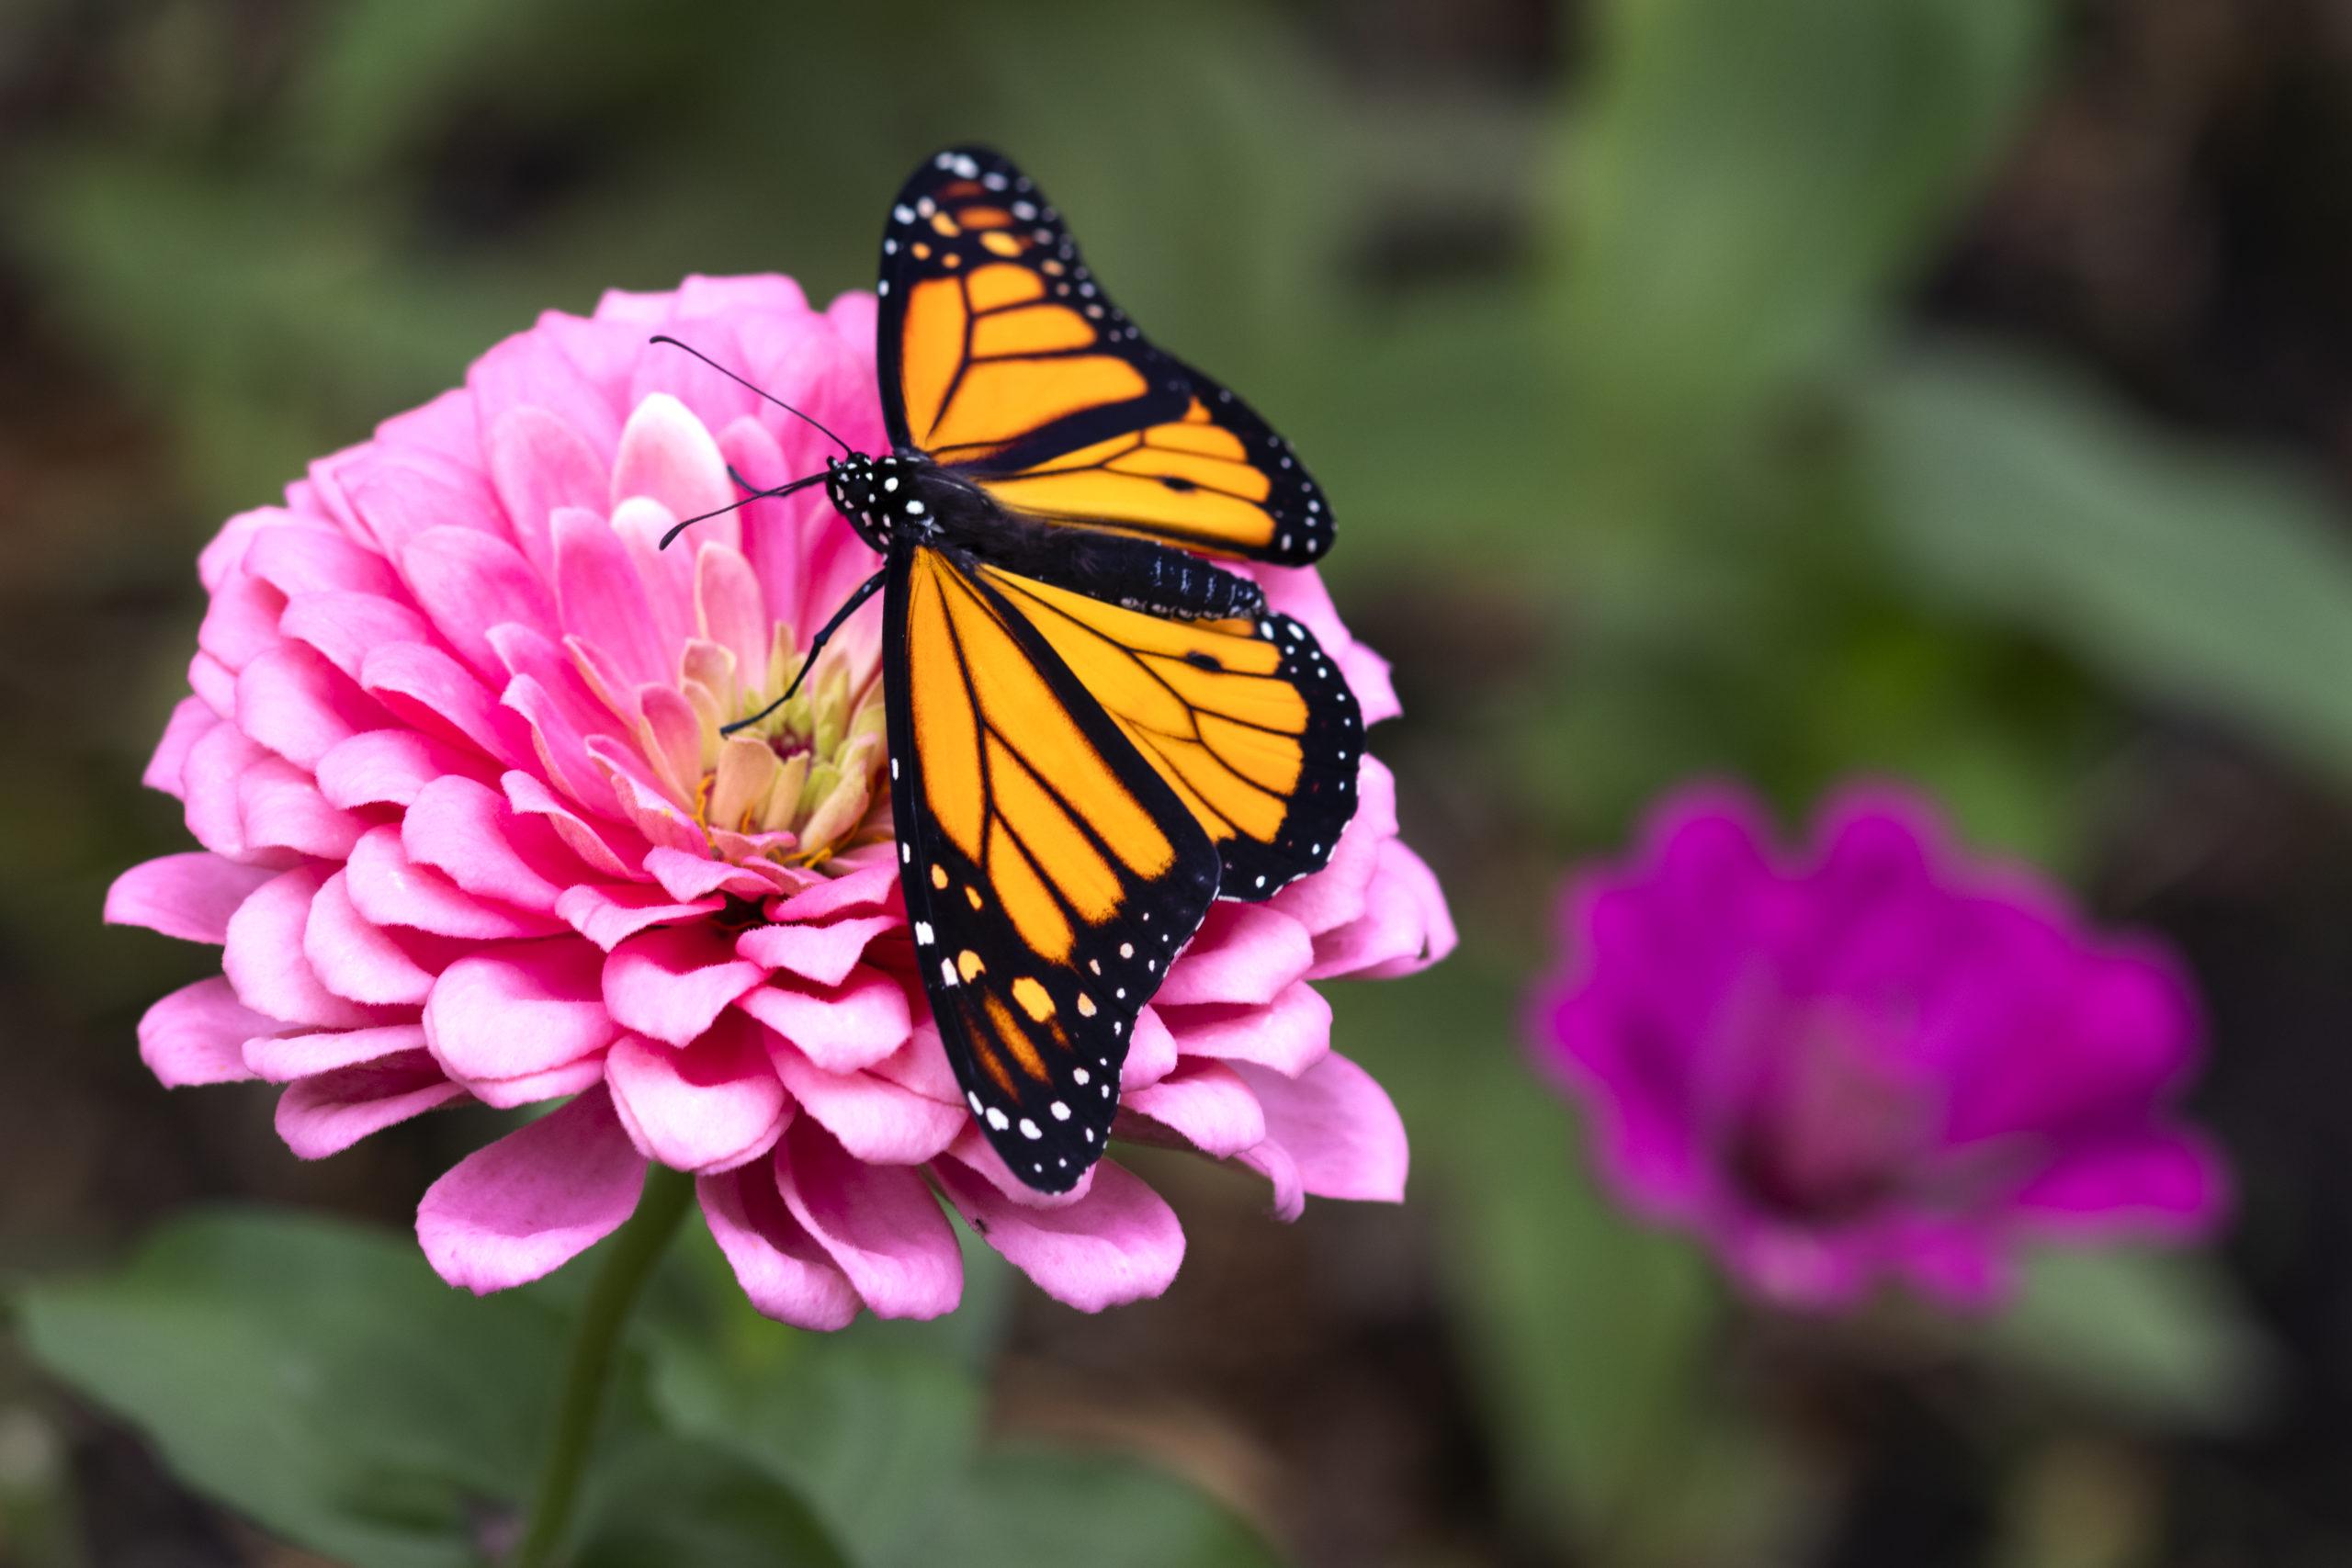 Butterfly on a zinnia